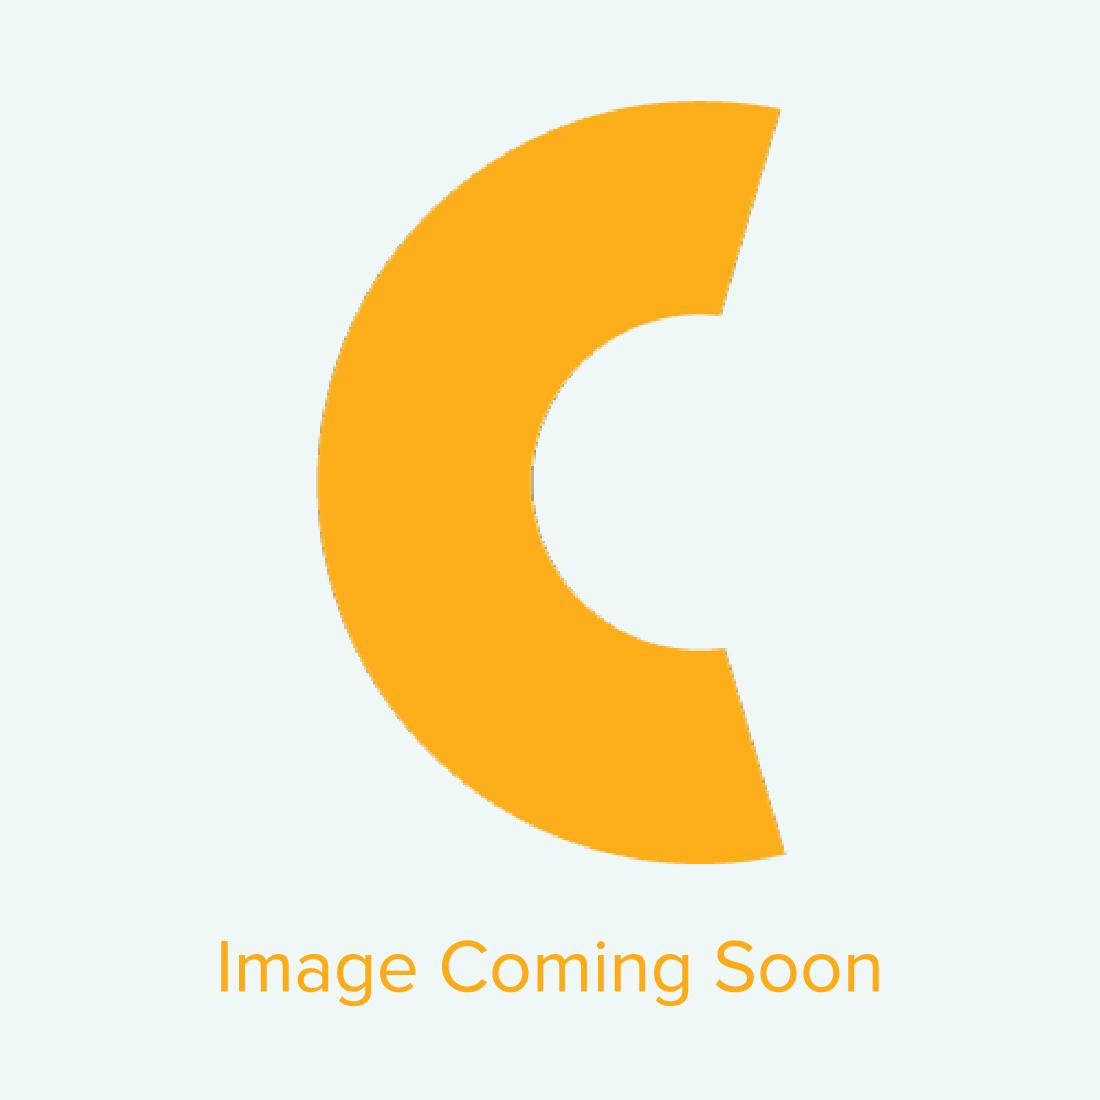 "Unisub Aluminum Sublimation License Plate Cover - 5.875"" x 11.875"""